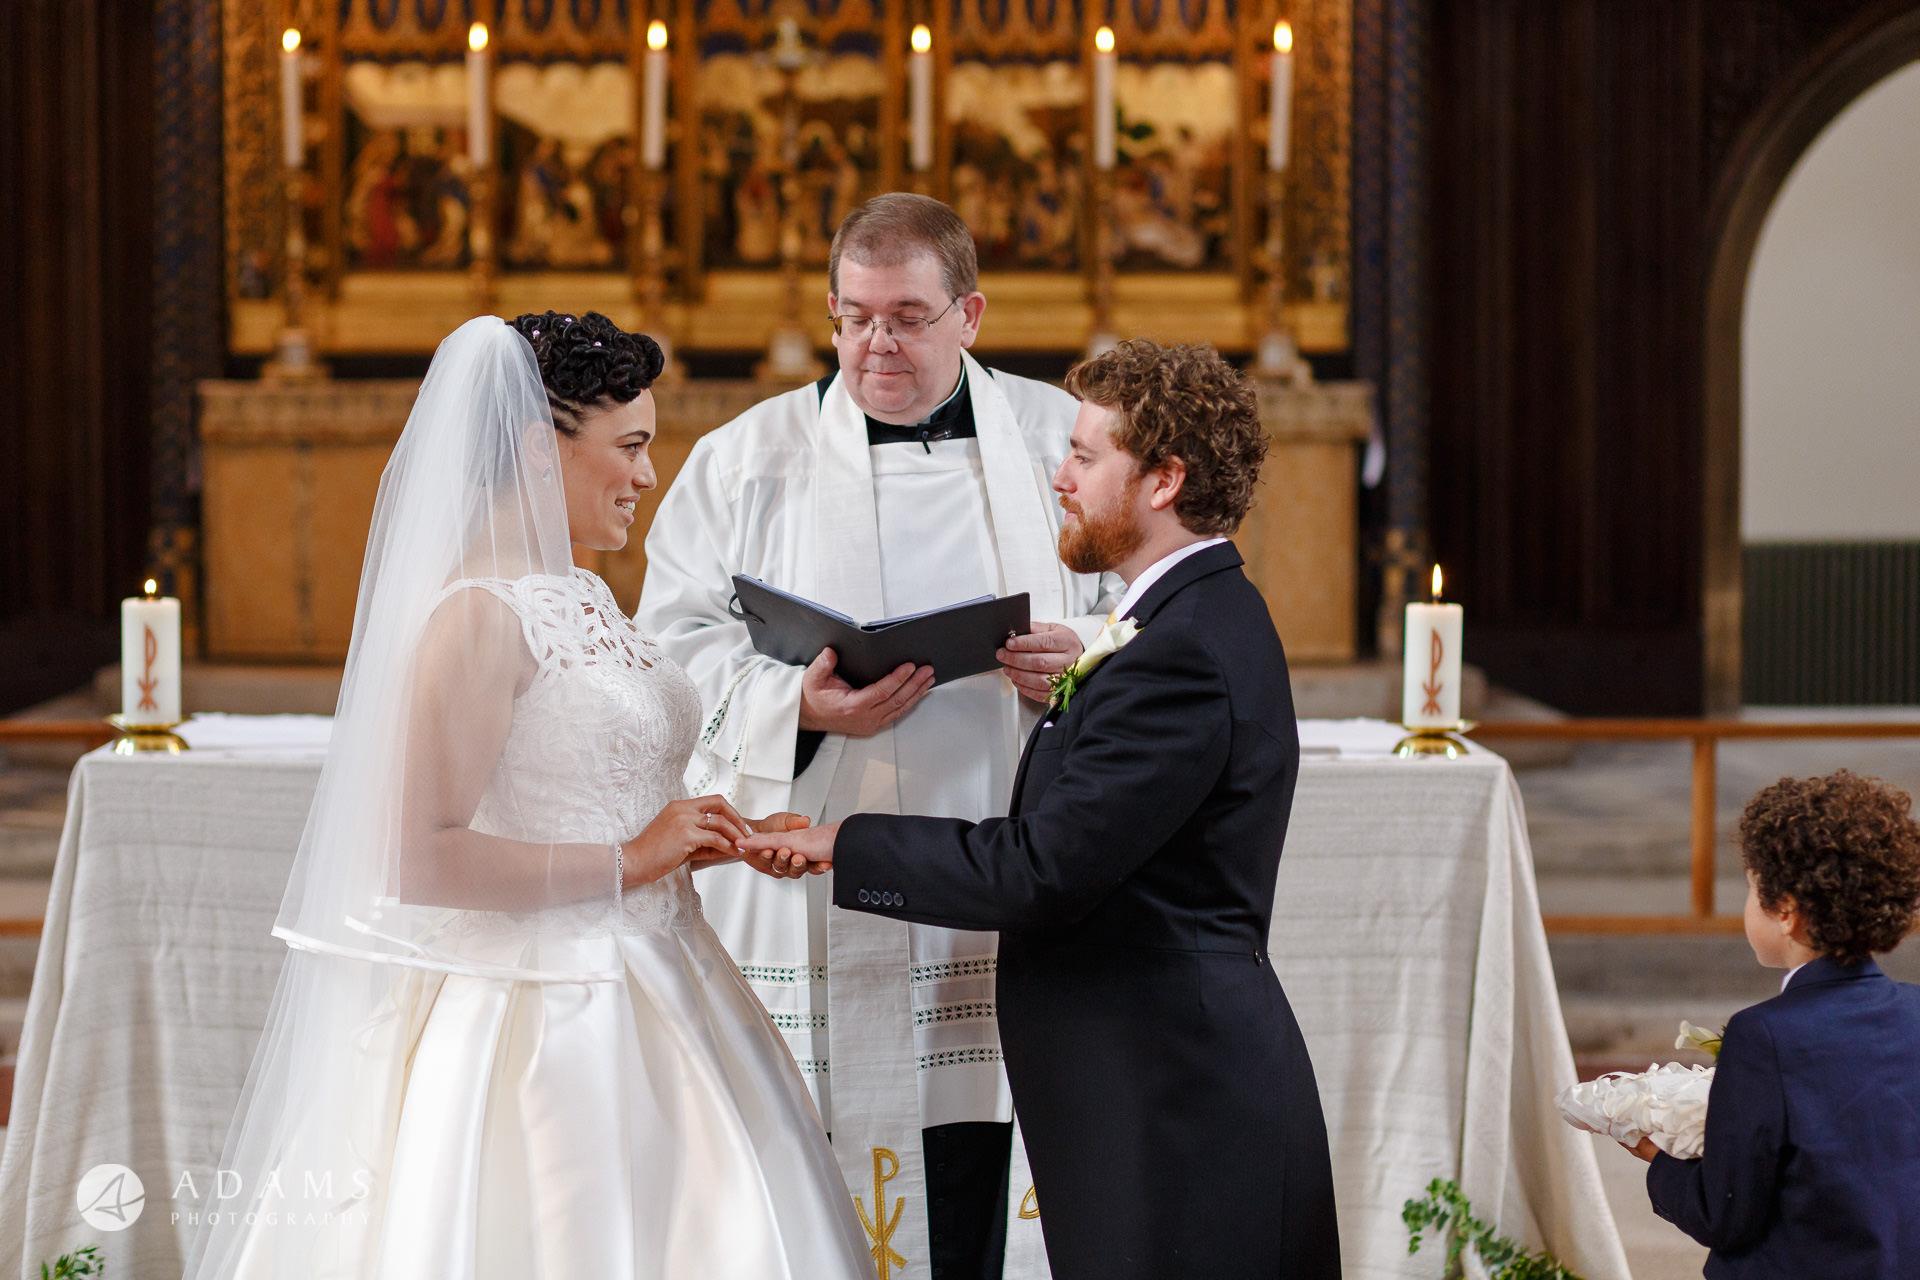 Morden Hall Wedding bride puts a ring on groom